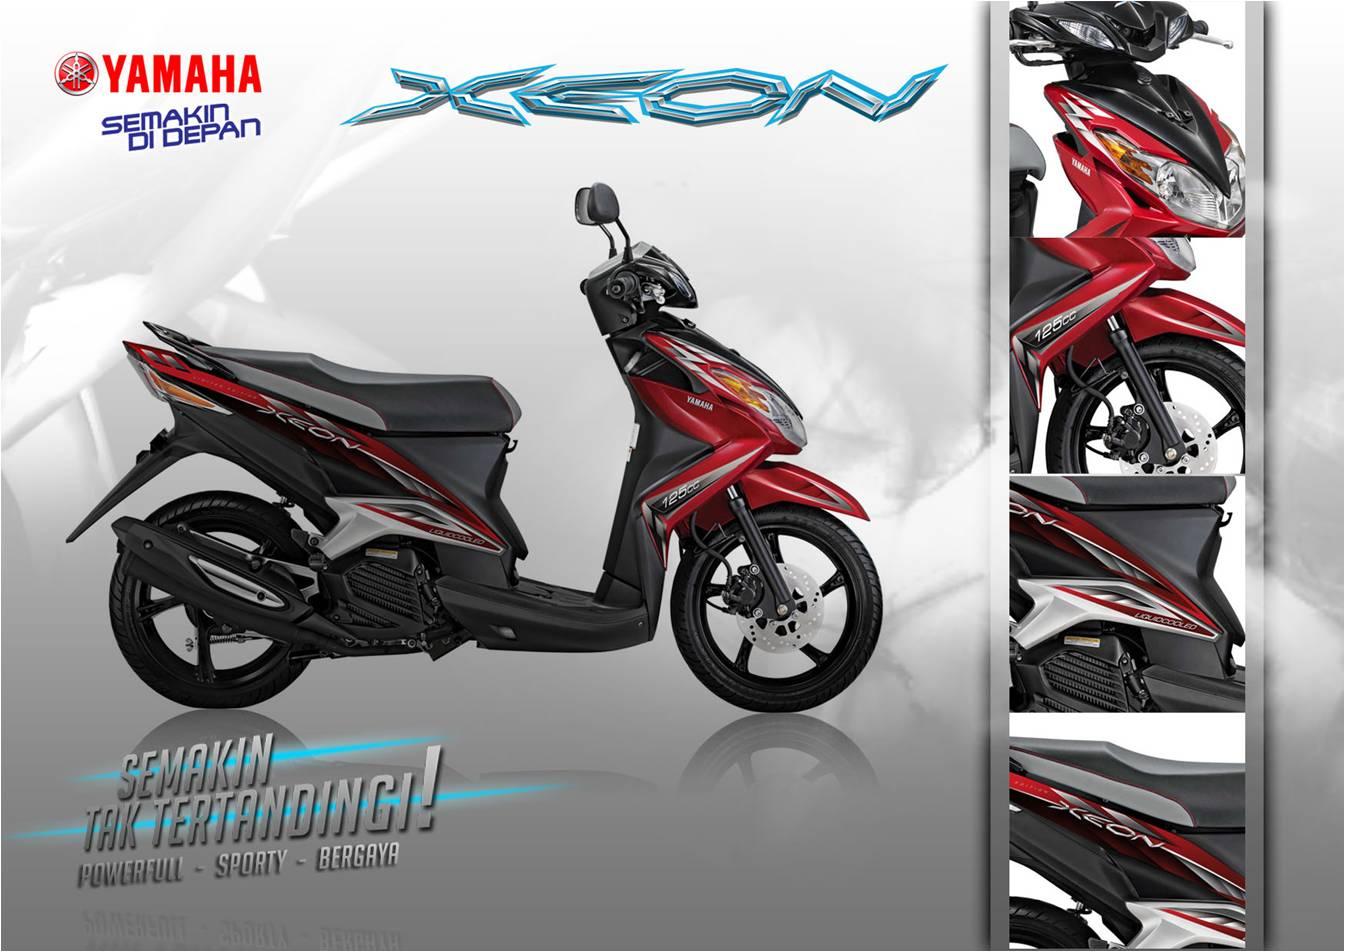 Comparison Of Motorcycle Features, Suzuki Hayate 125 Vs